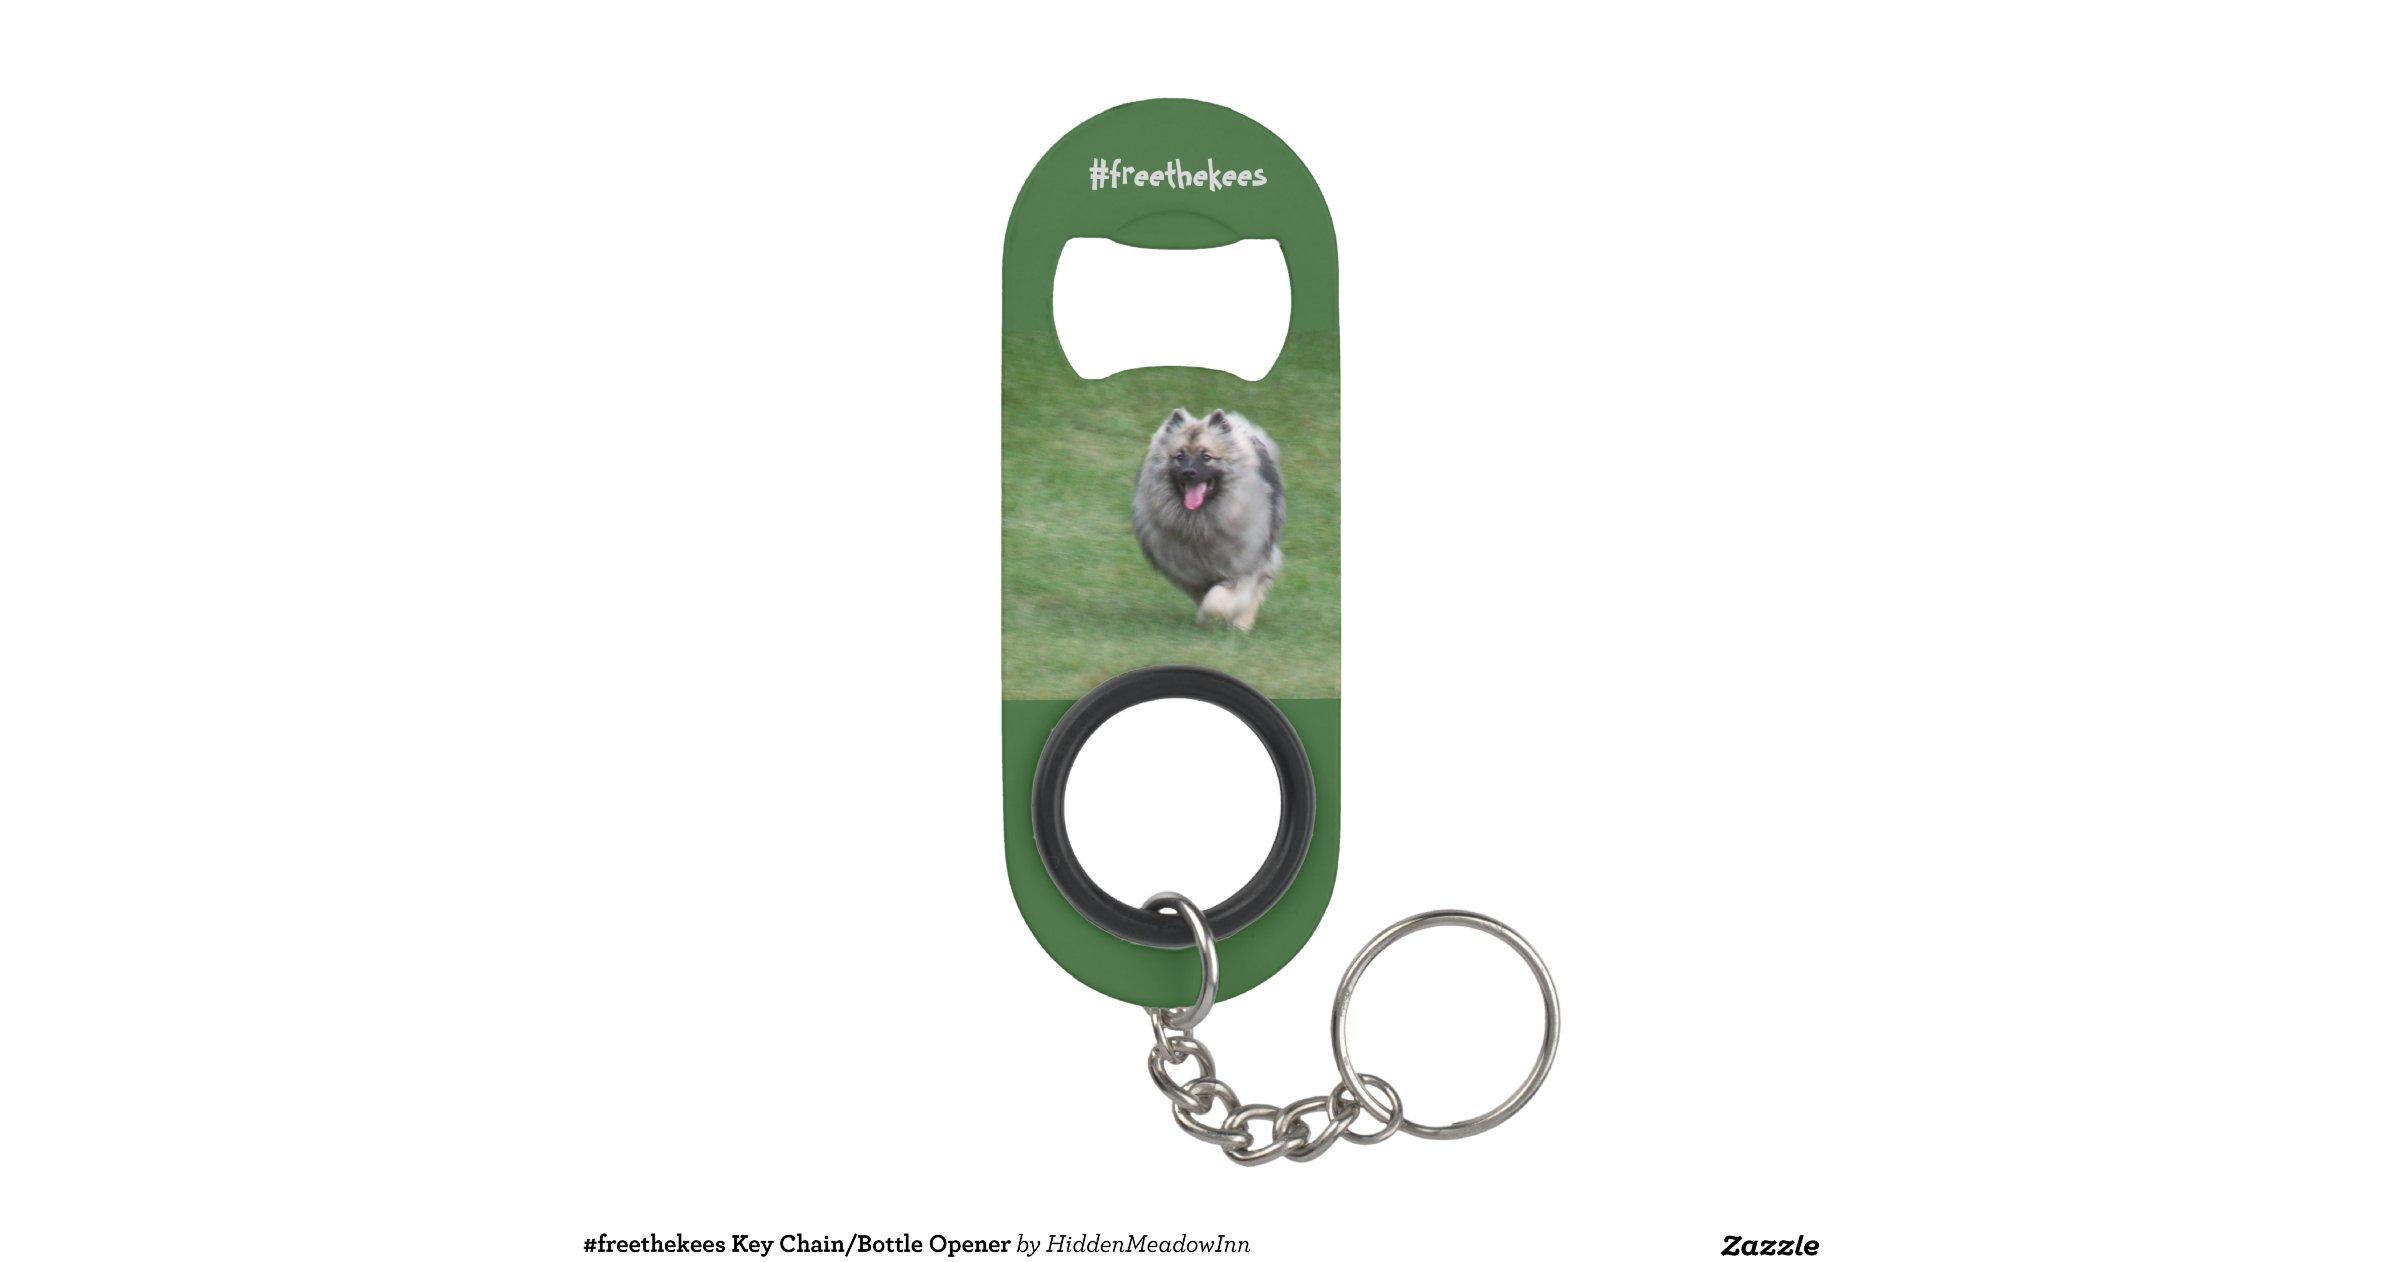 freethekees key chain bottle opener mini bottle opener zazzle. Black Bedroom Furniture Sets. Home Design Ideas